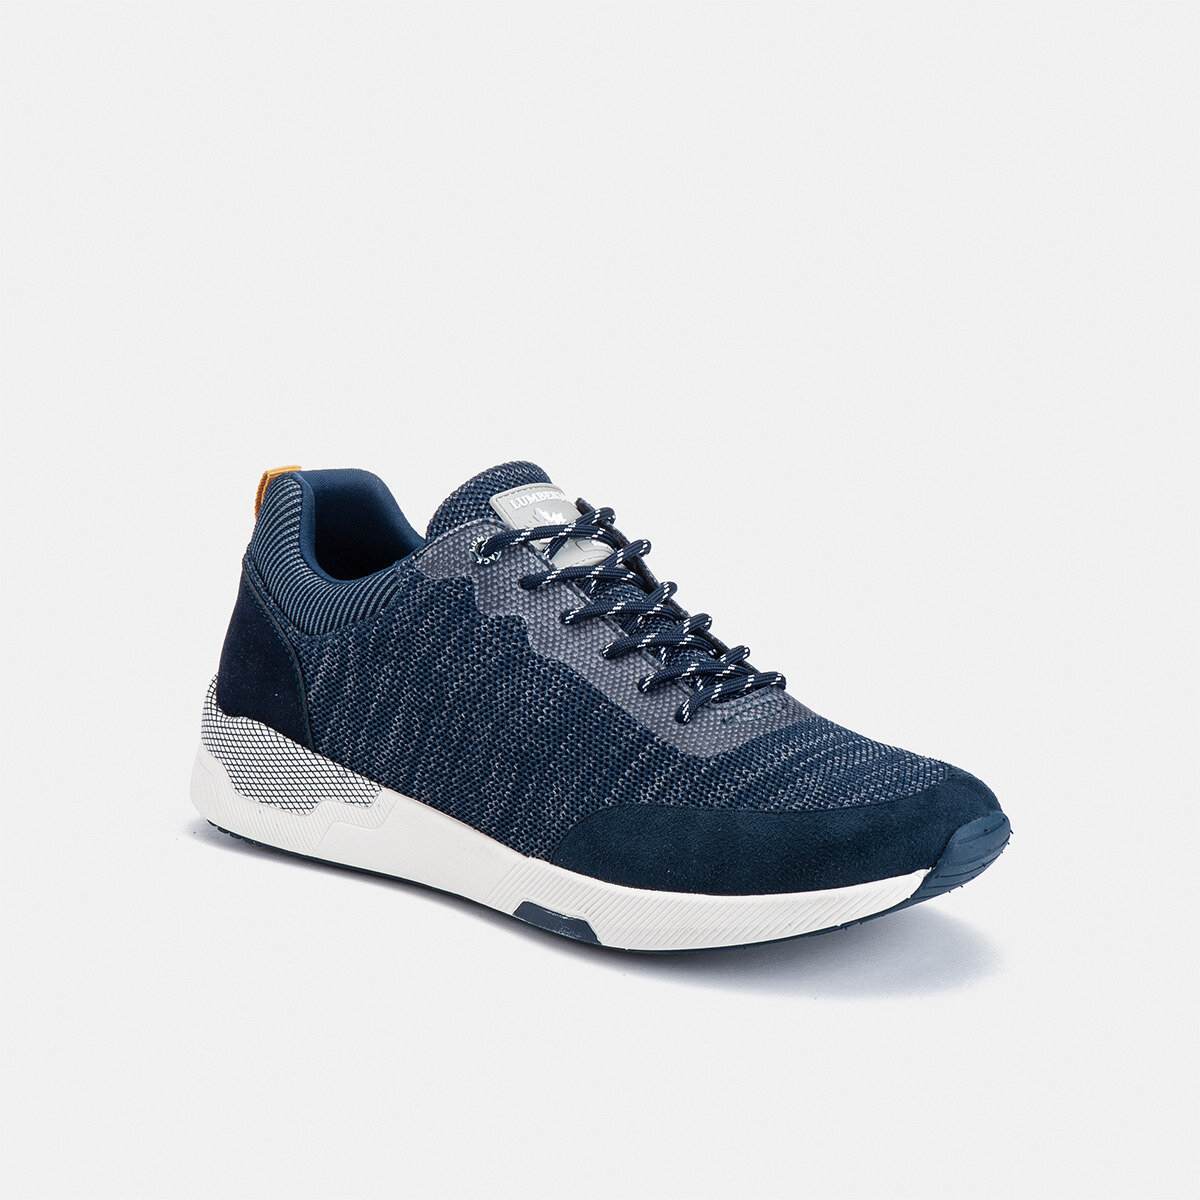 AUSTIN NAVY BLUE Man Sneakers